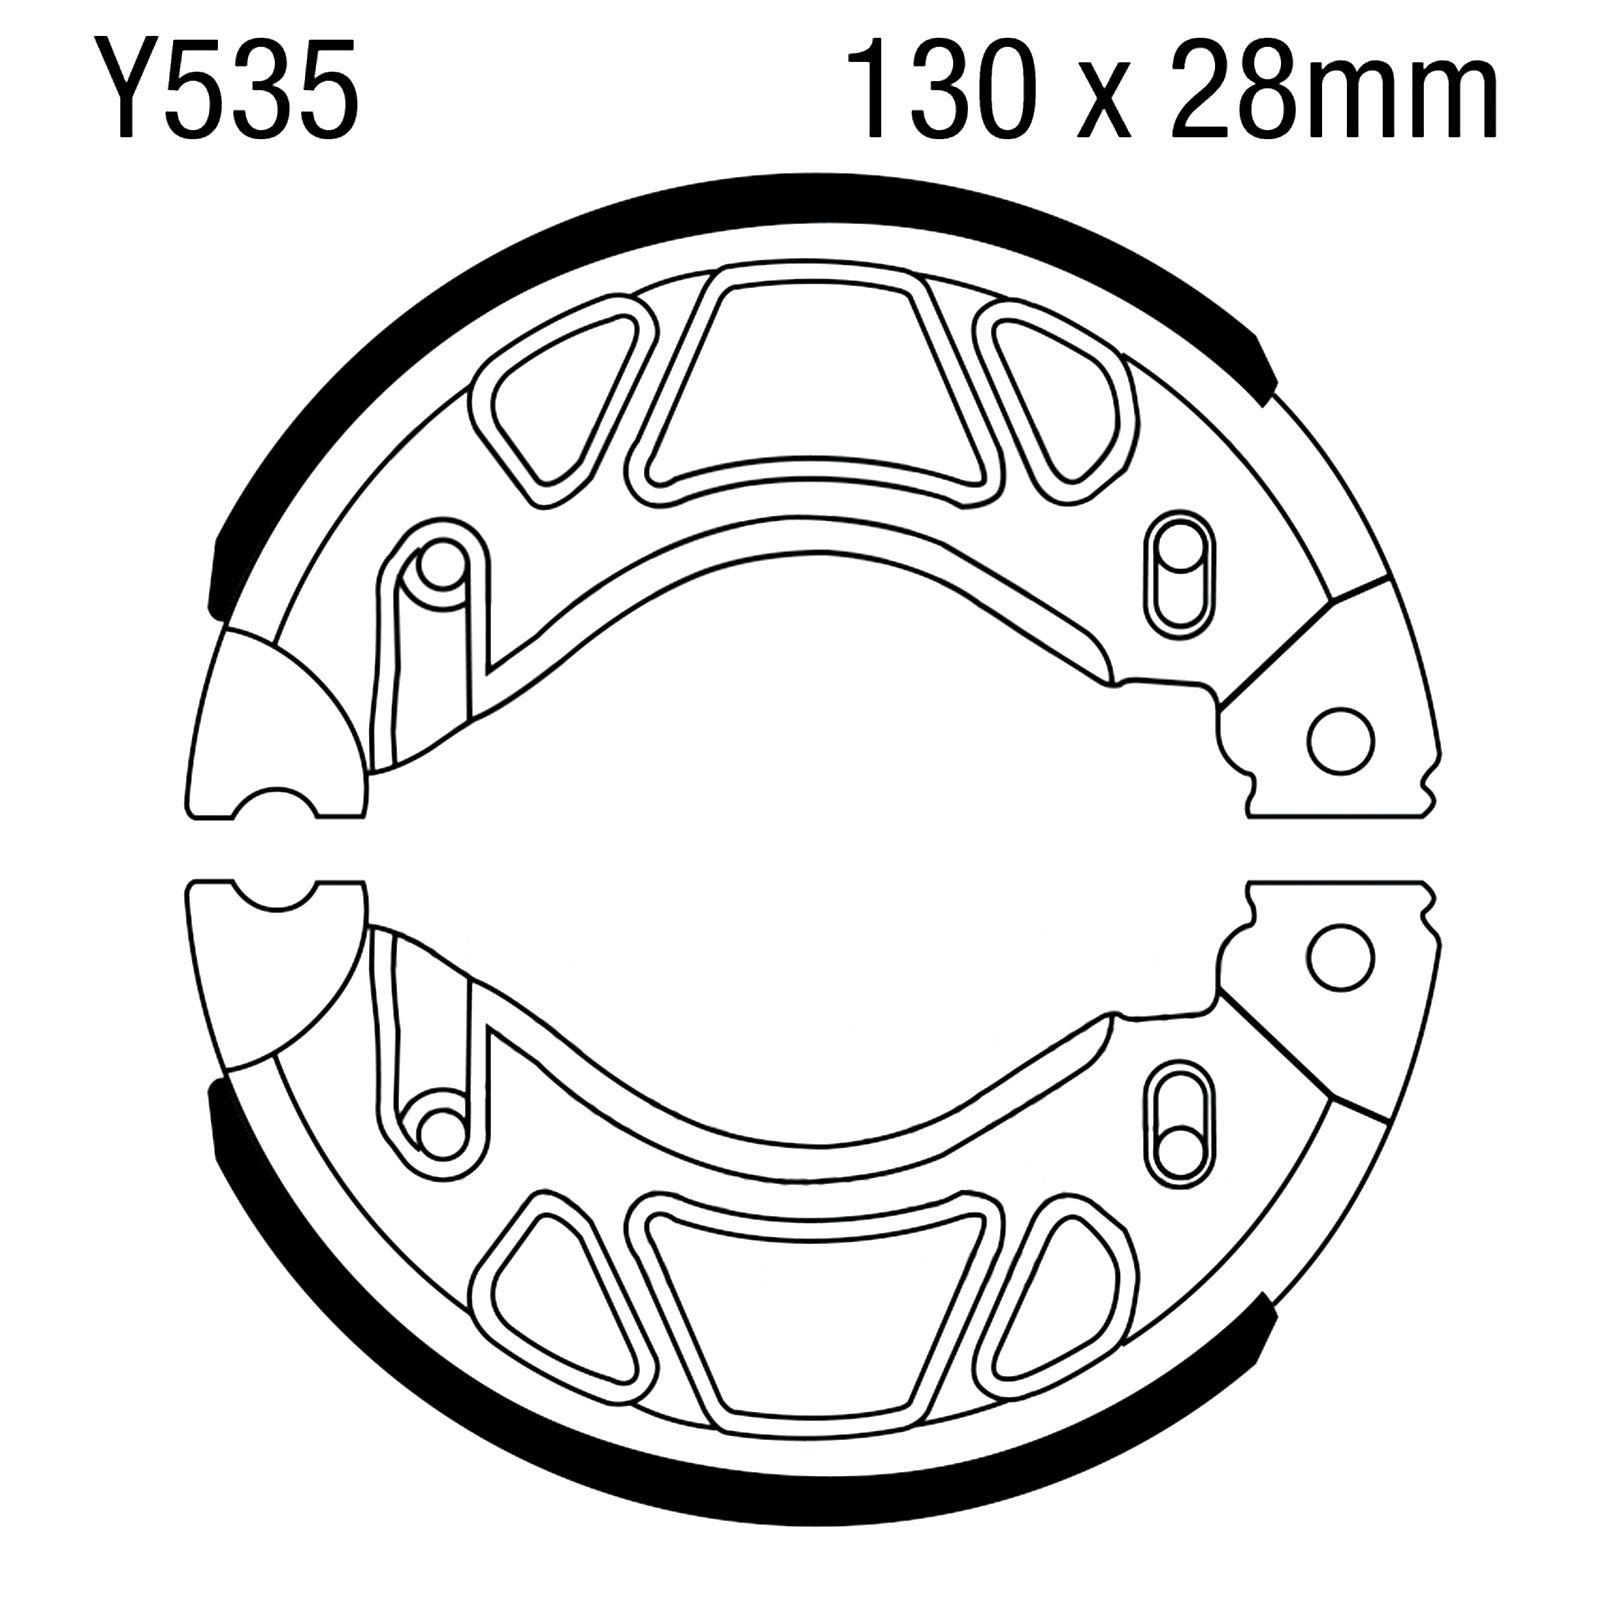 LUTH Premium Profi Parts Filter BOSCH 00579496 BBZ154HF ALTERNATIVE Exhaust air filter Cassette for vacuum cleaner